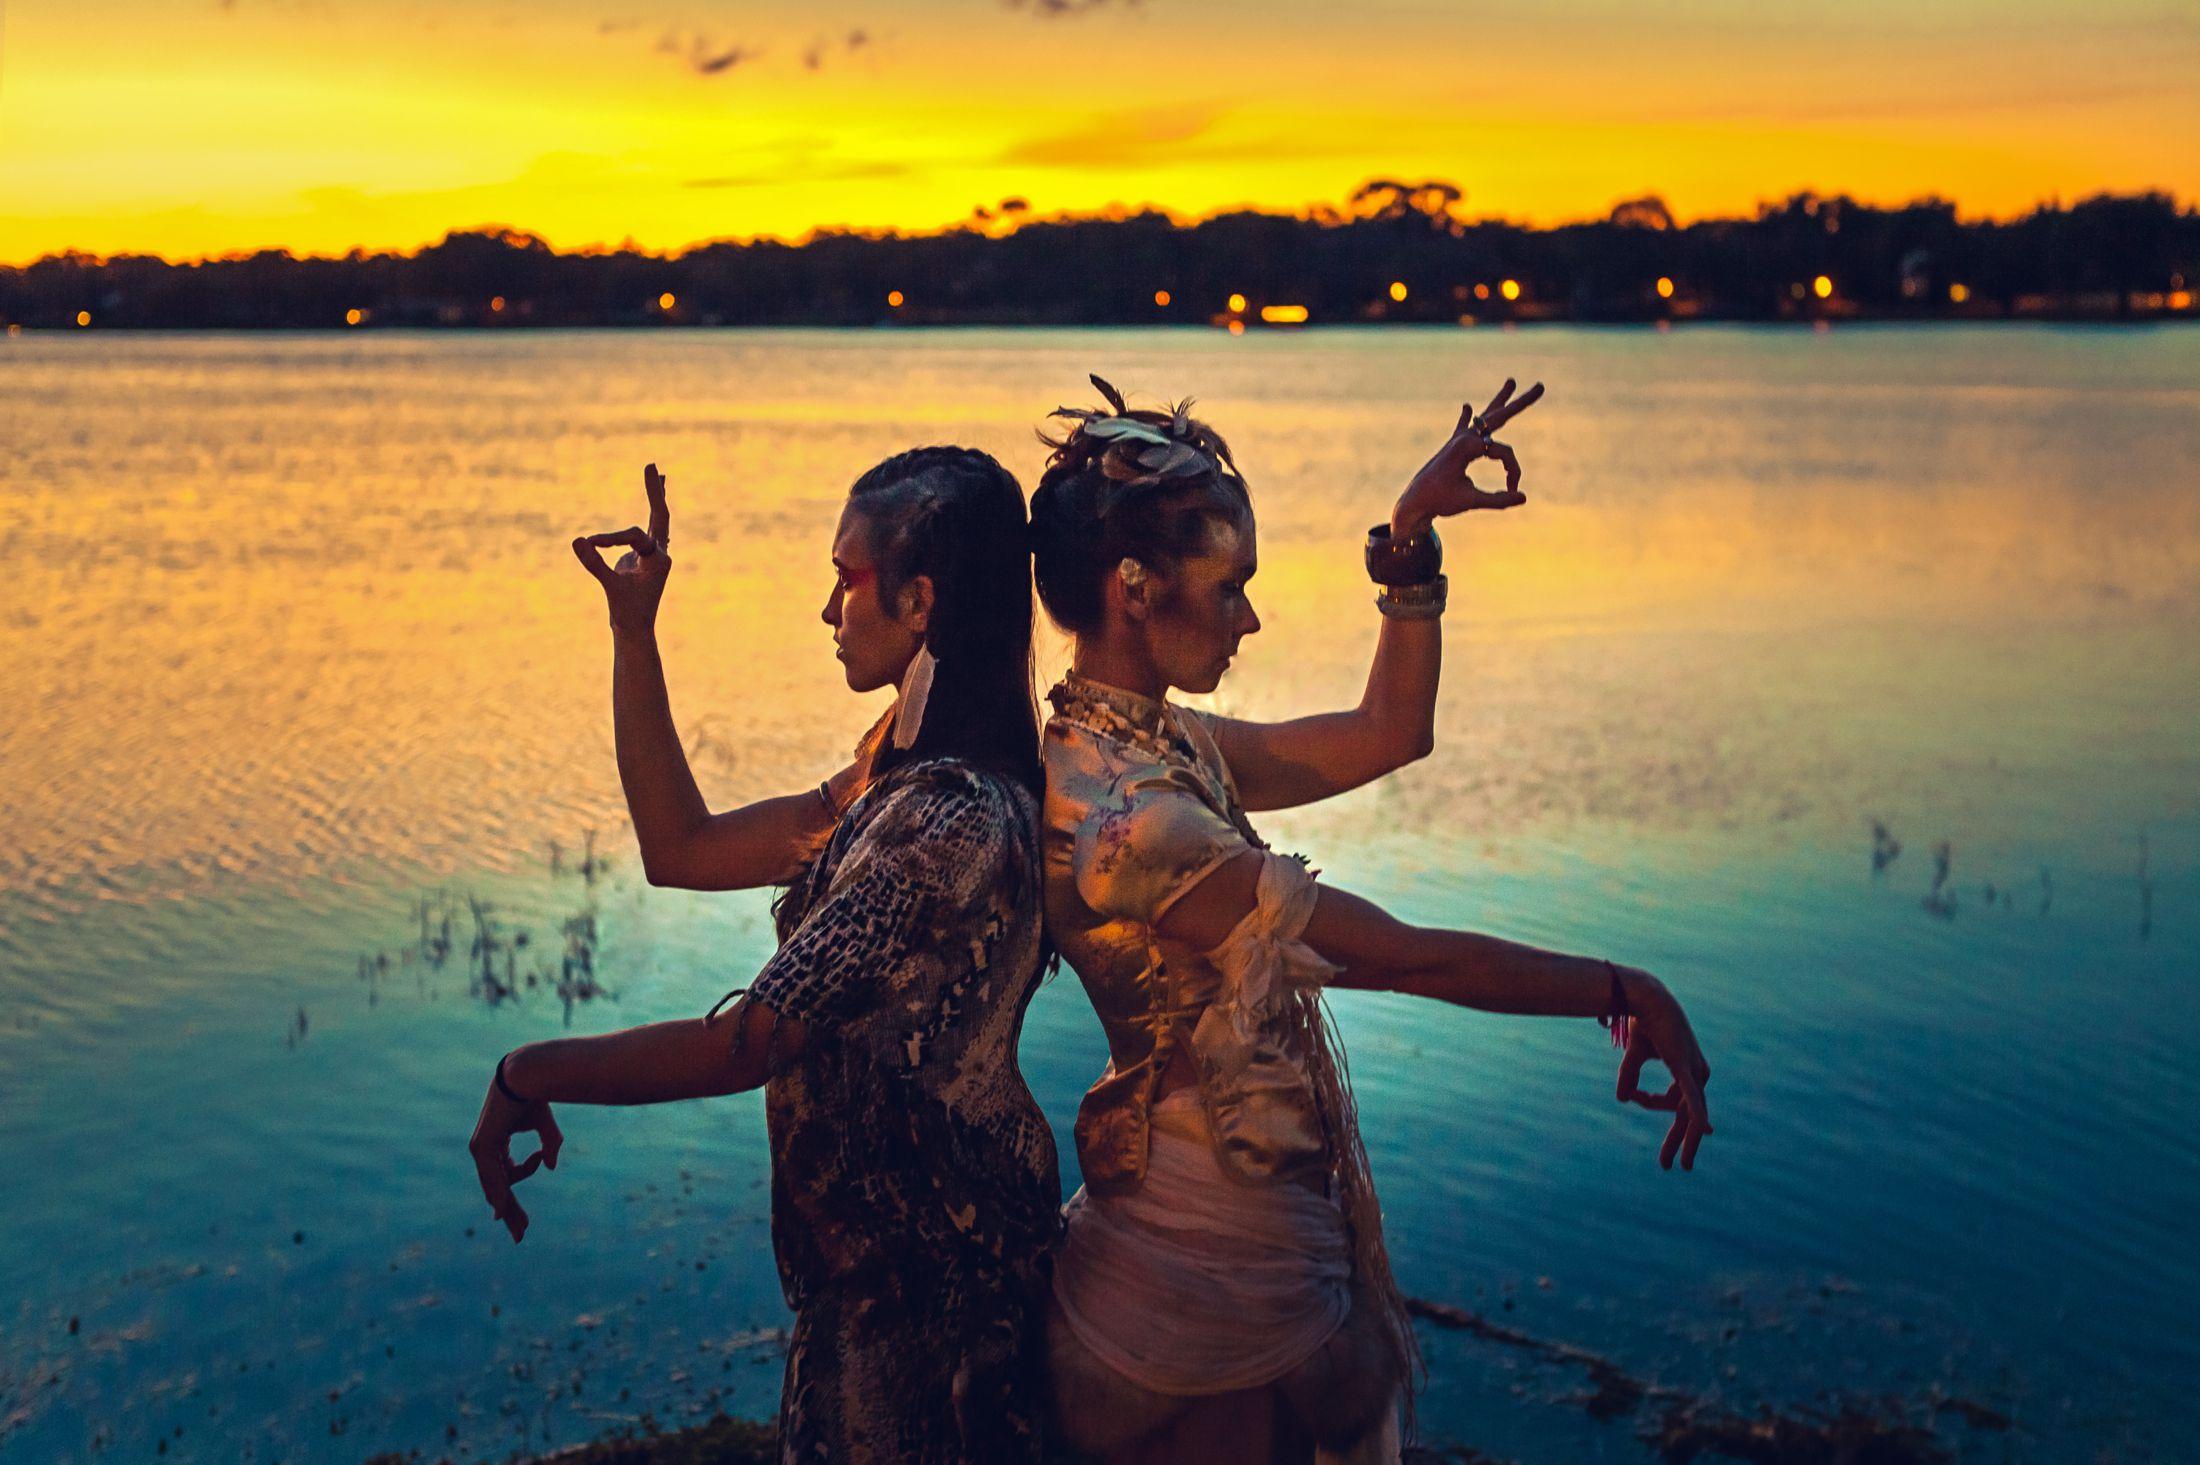 Electric Forest yoga LED light nomad festival style ethnic global fashion shoot warpaint tribal 9.jpg